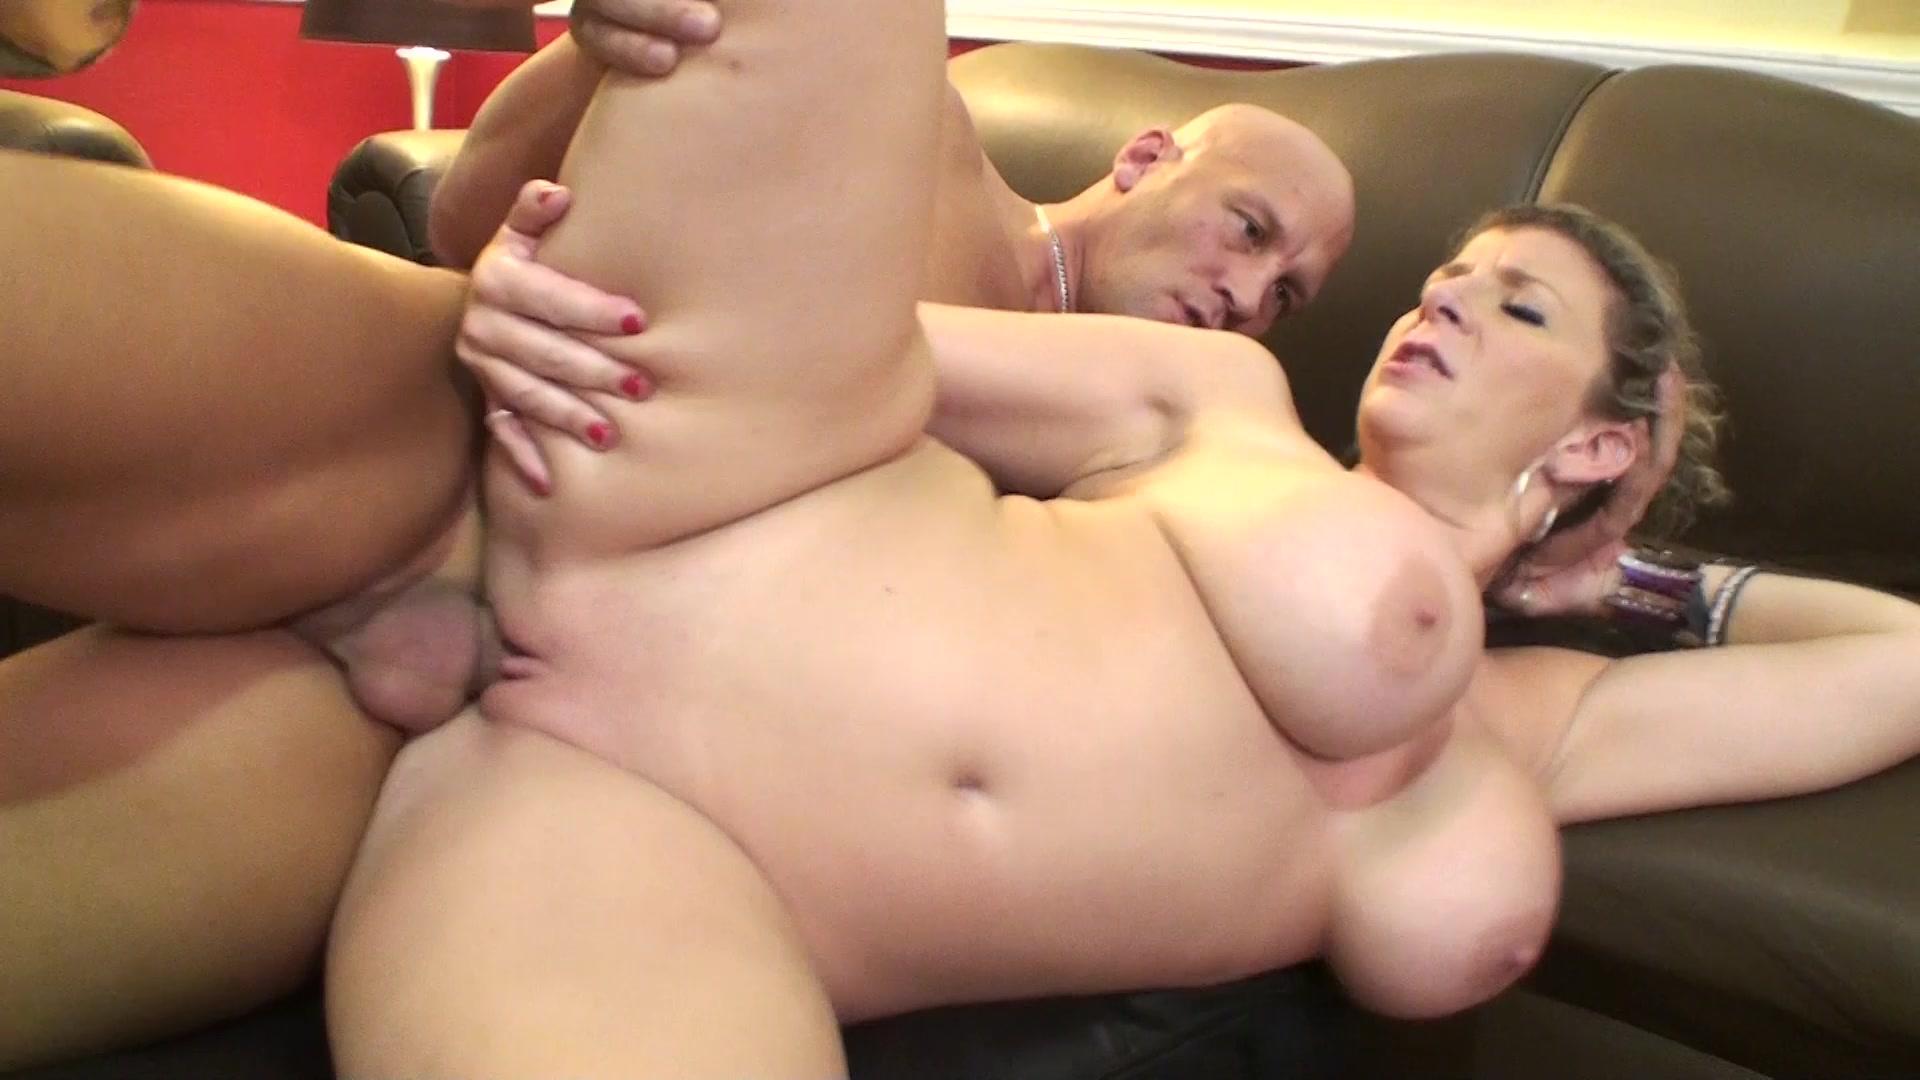 Порно трахают толстушку сару джей в стрингах